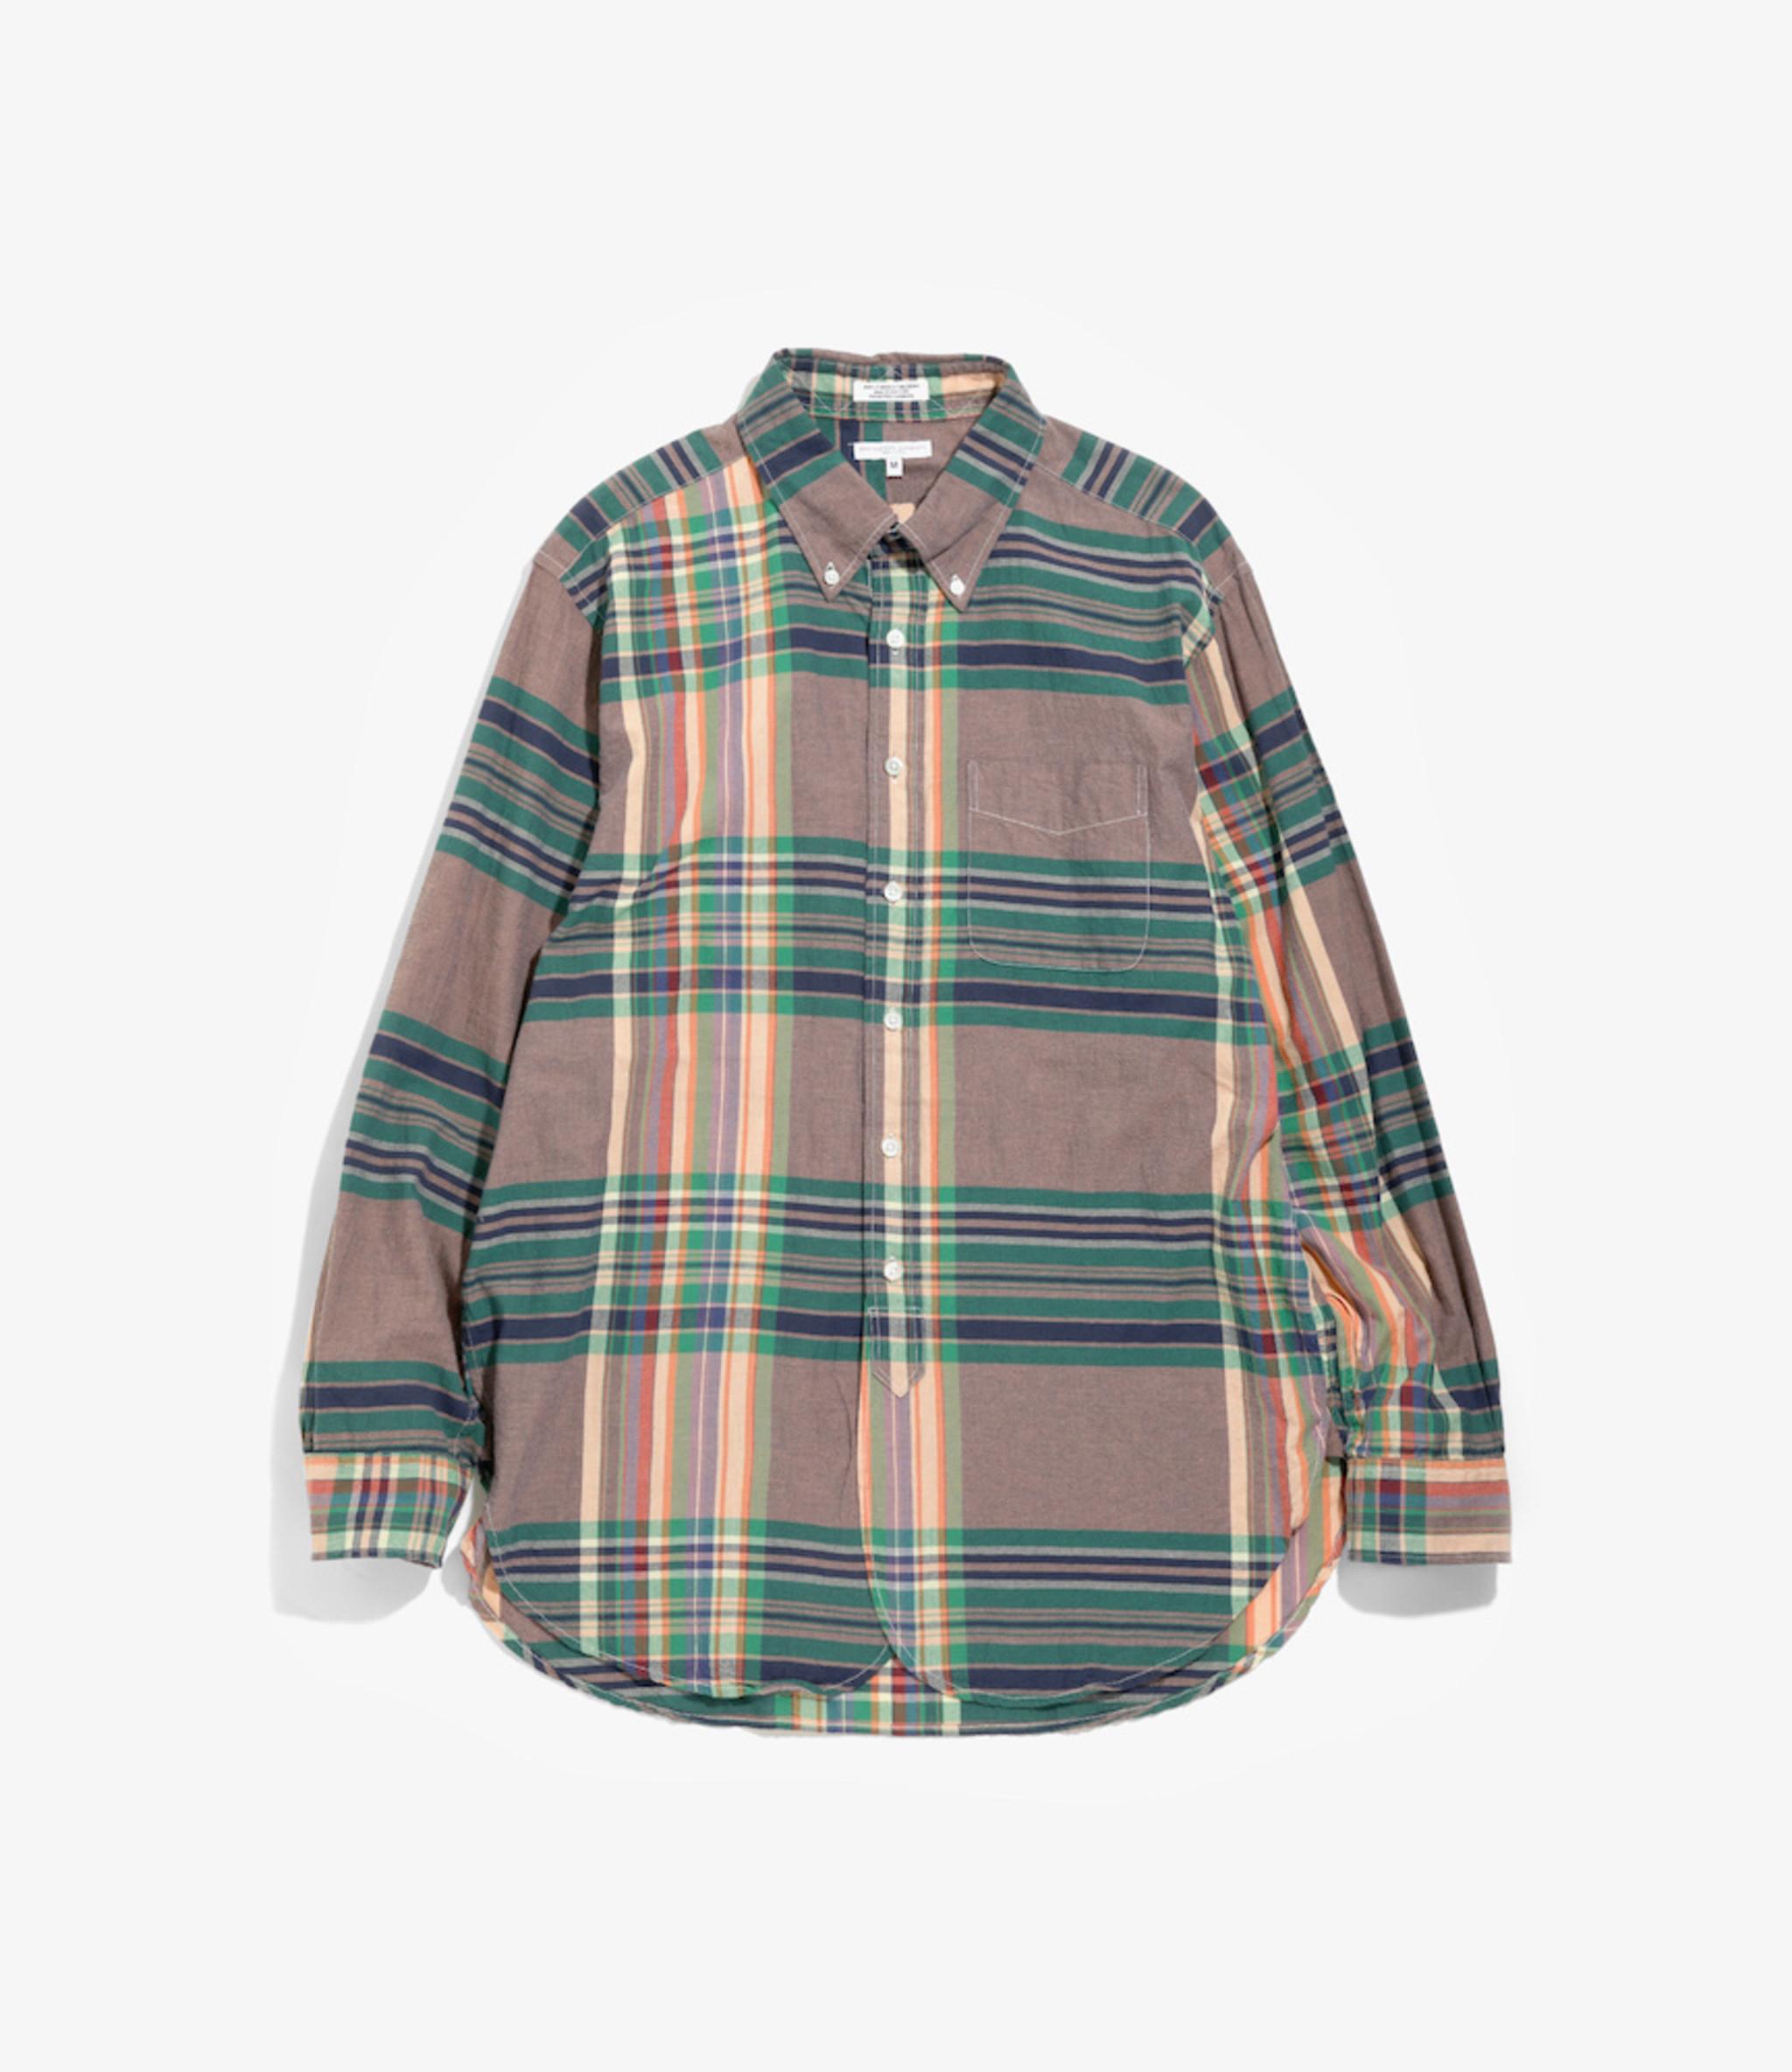 Engineered Garments 19 Century BD Shirt - Orange/Grn/Nvy Big Madras Plaid